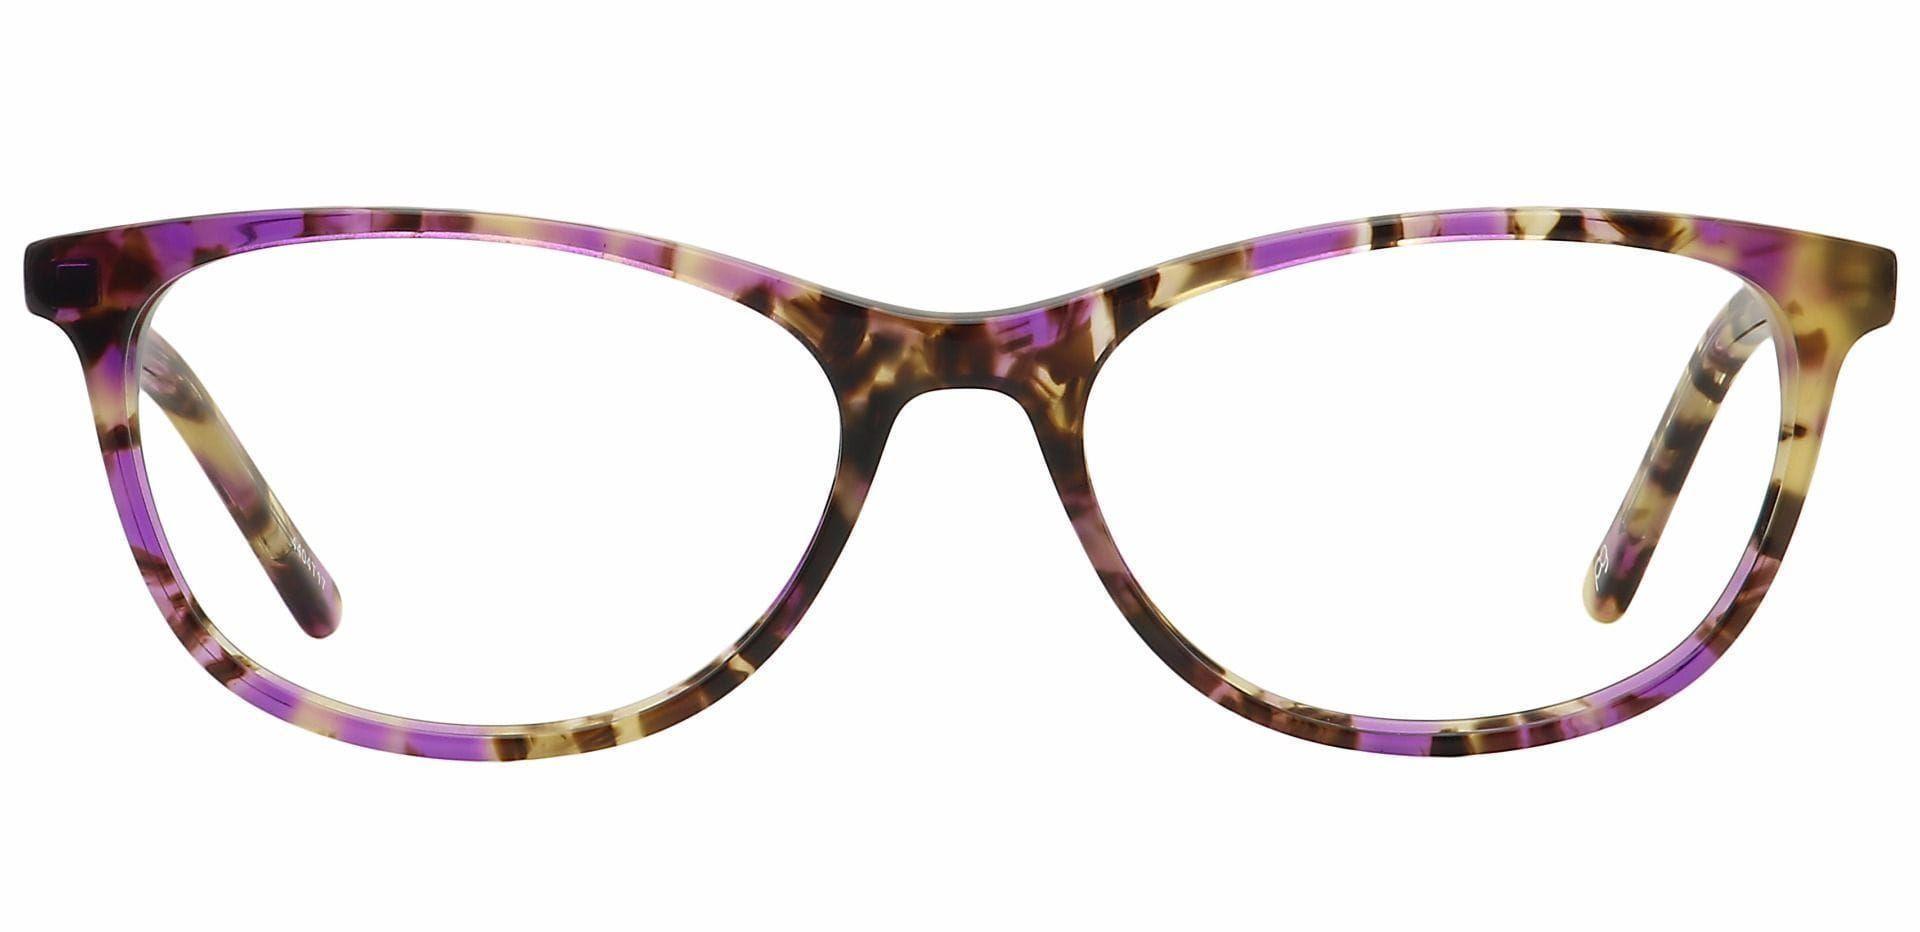 Freya Oval Prescription Glasses - Purple